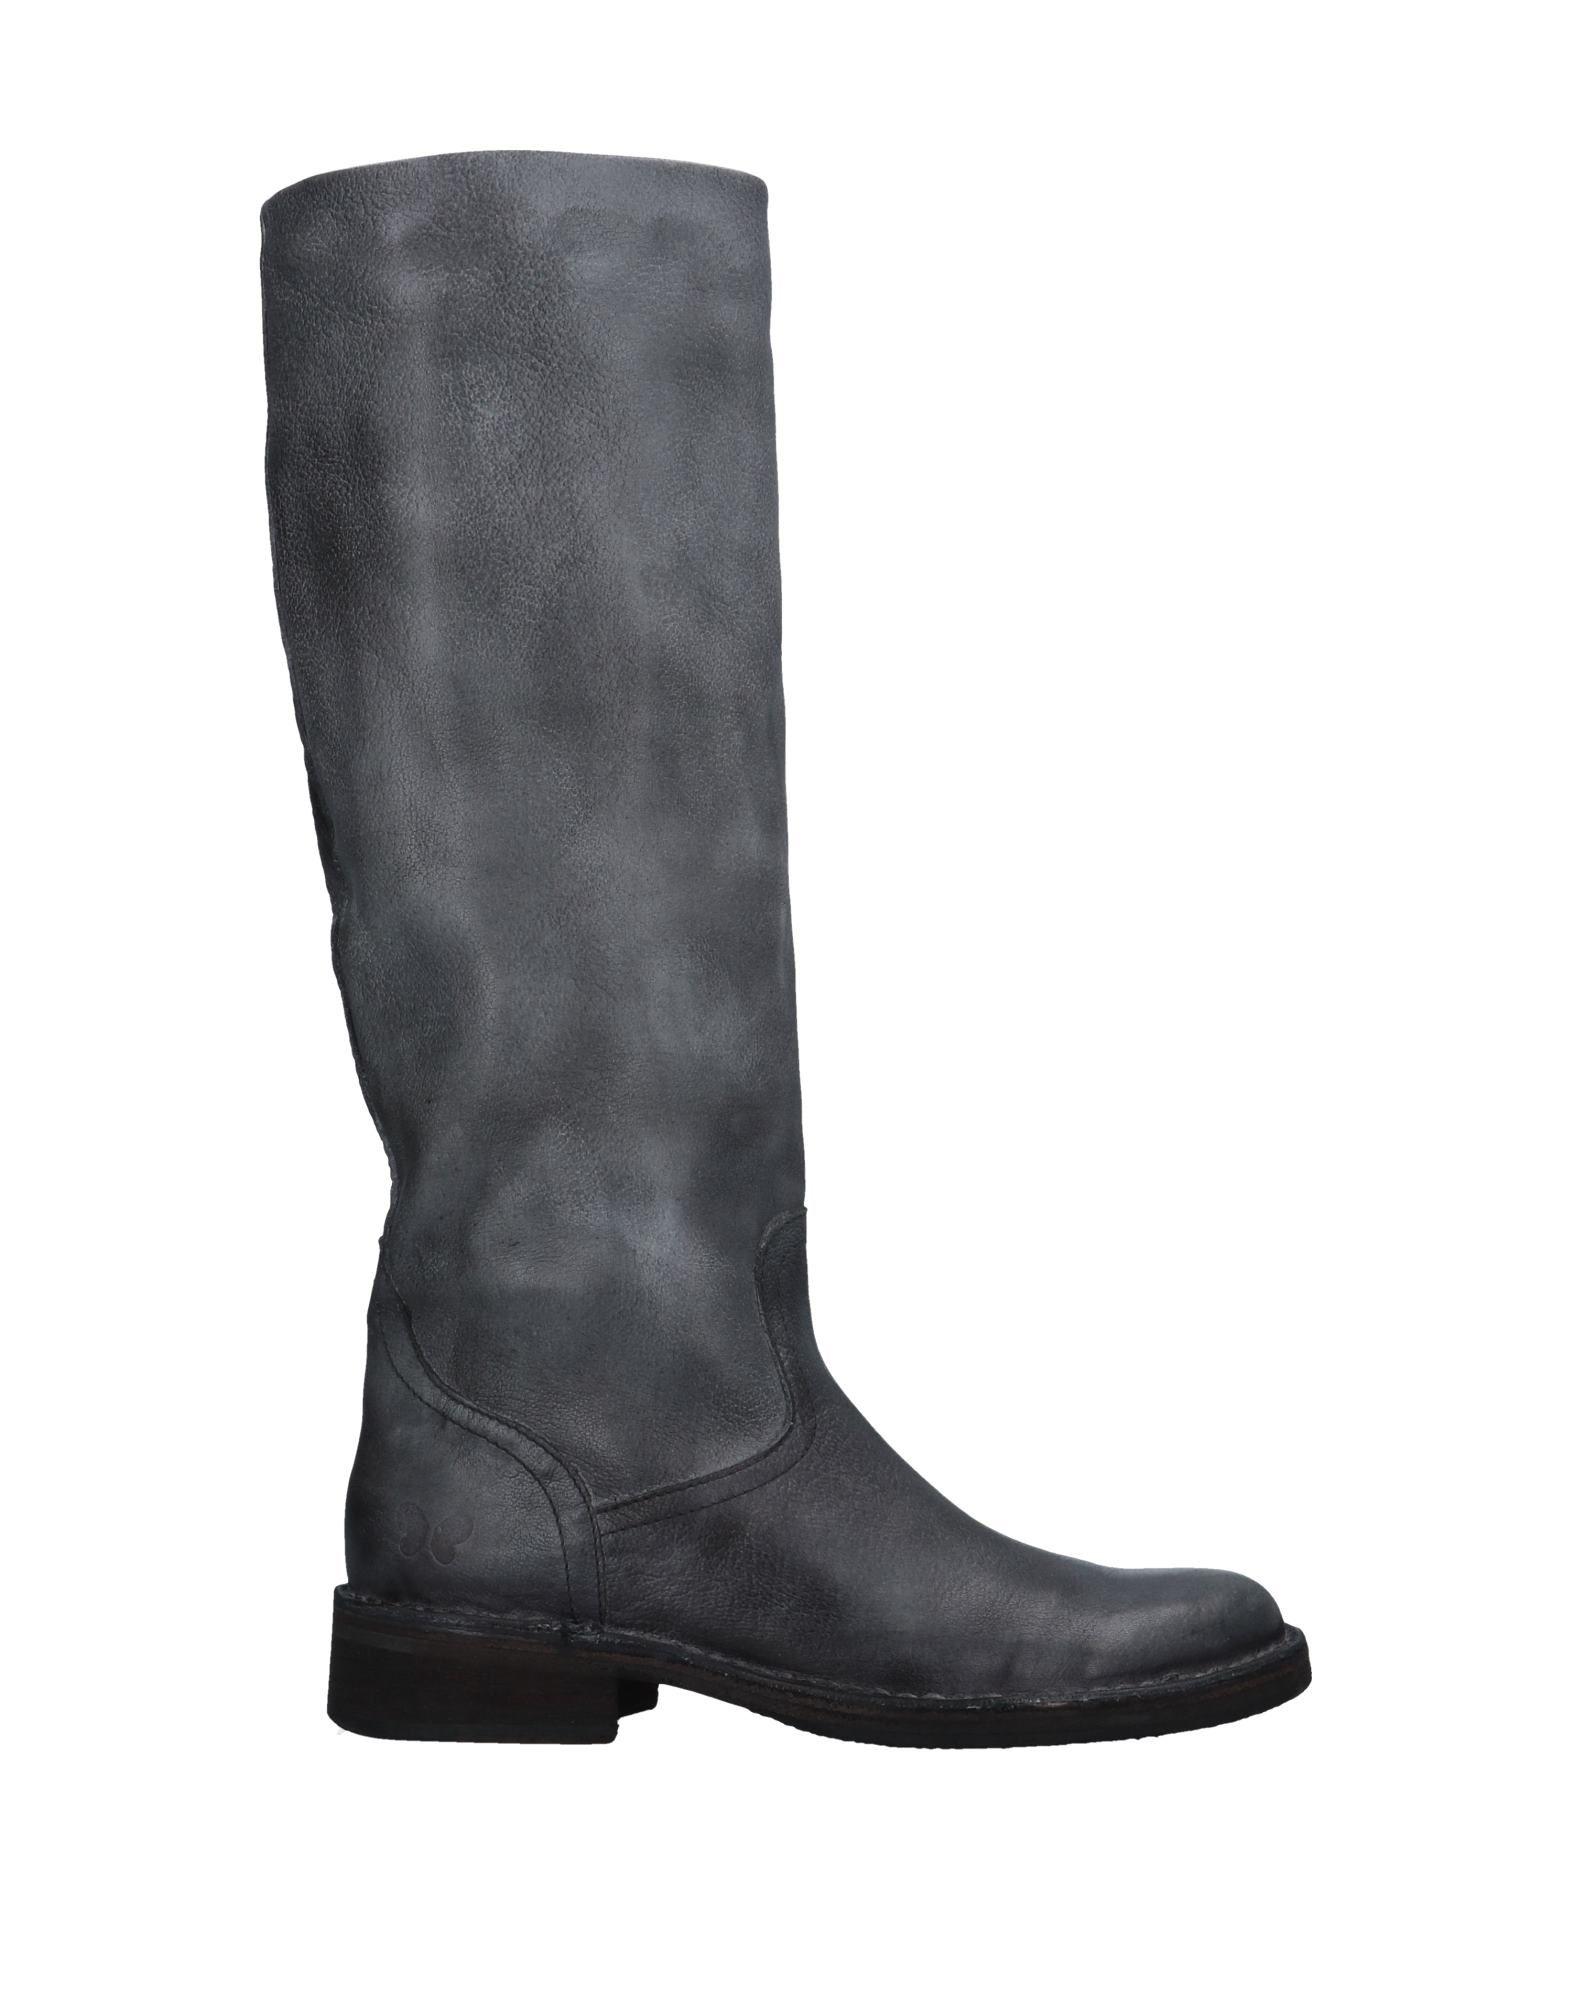 Felmini Boots - Women Felmini Boots online 11532239NA on  Australia - 11532239NA online 877019